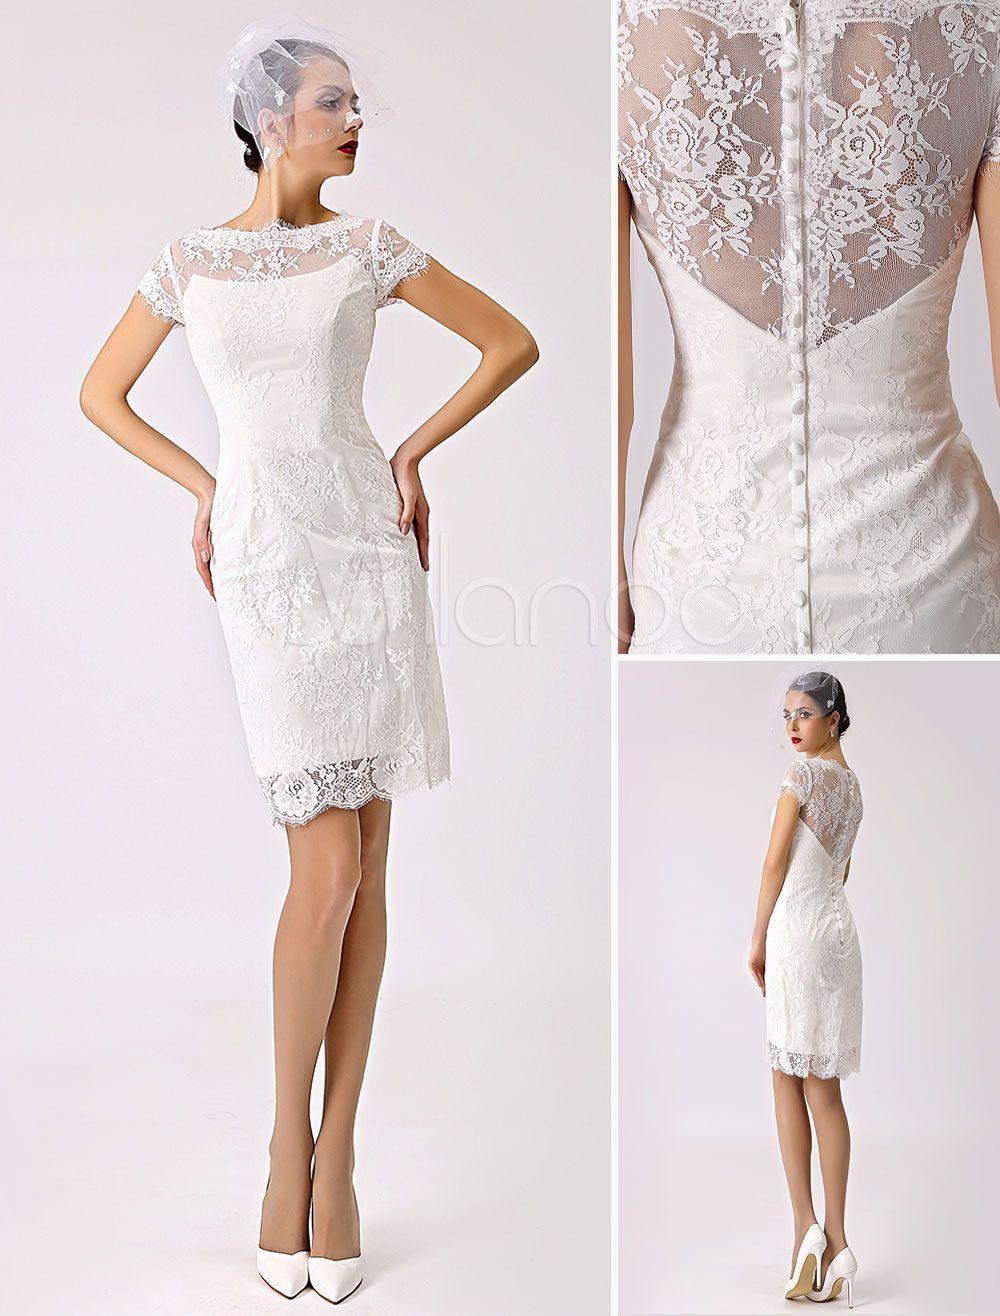 Kurz Hochzeitskleider 2020 Spitze Illusion Kurz Sleeve